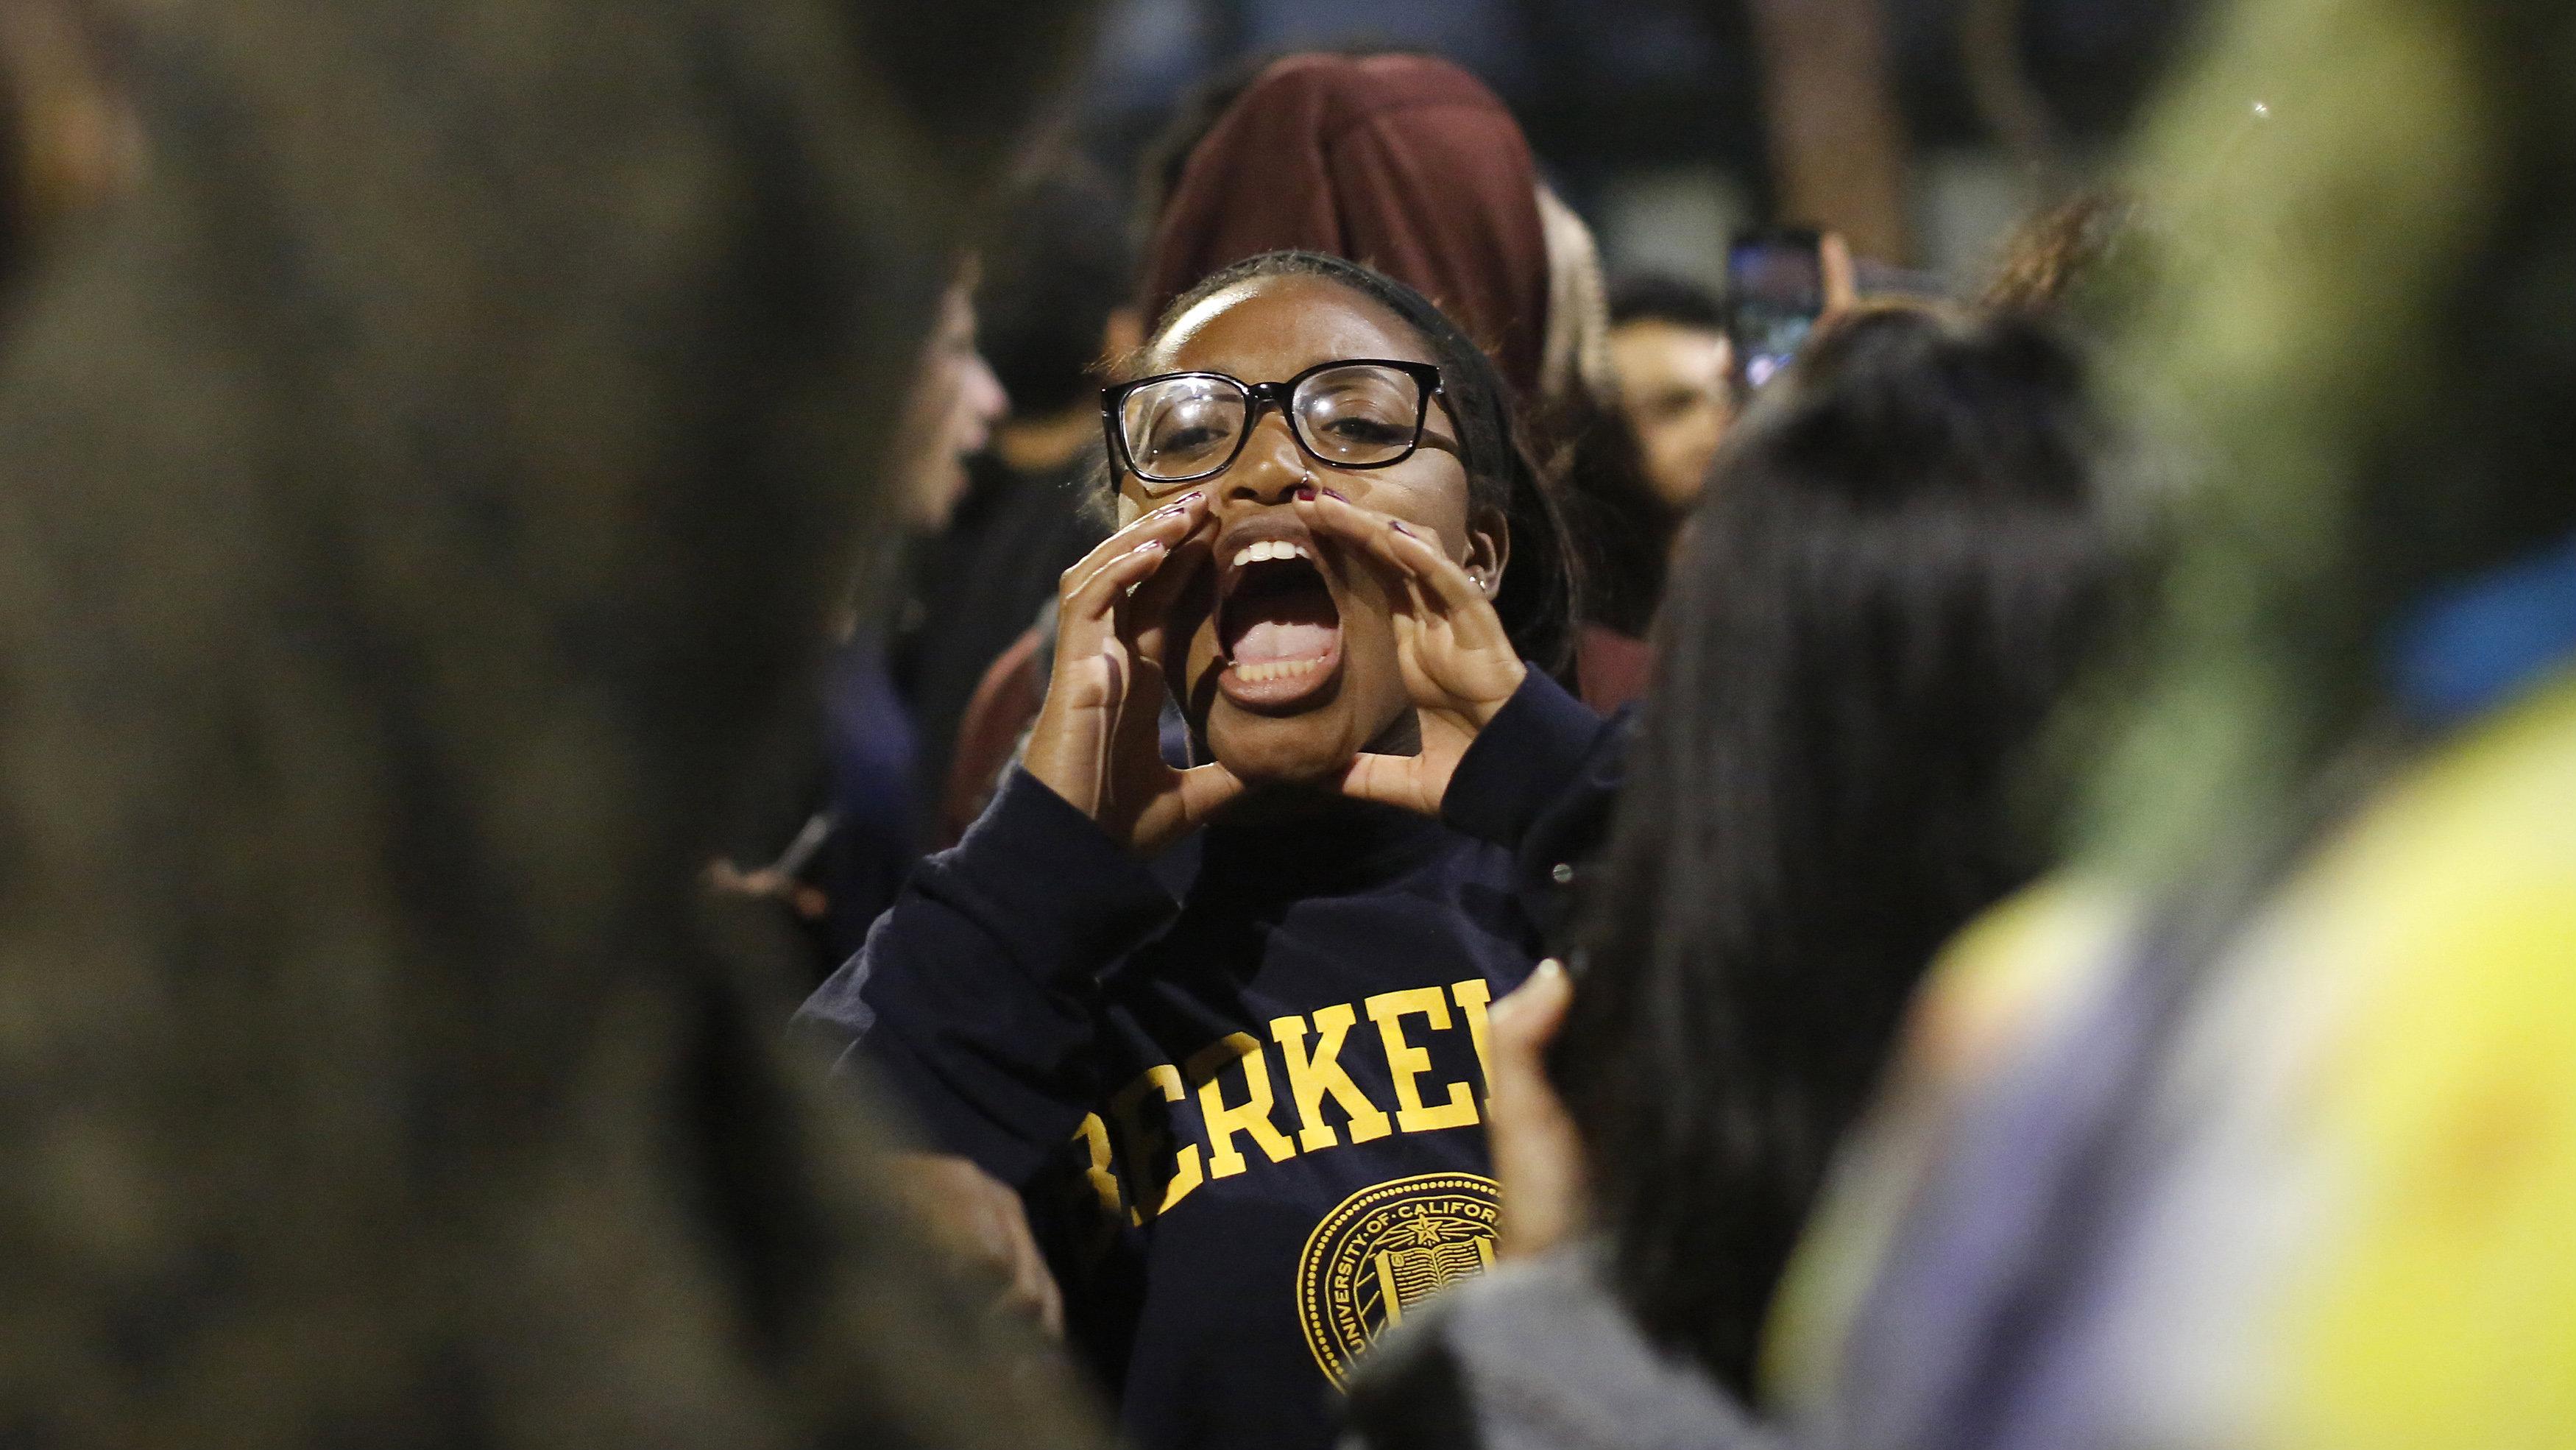 student protestor